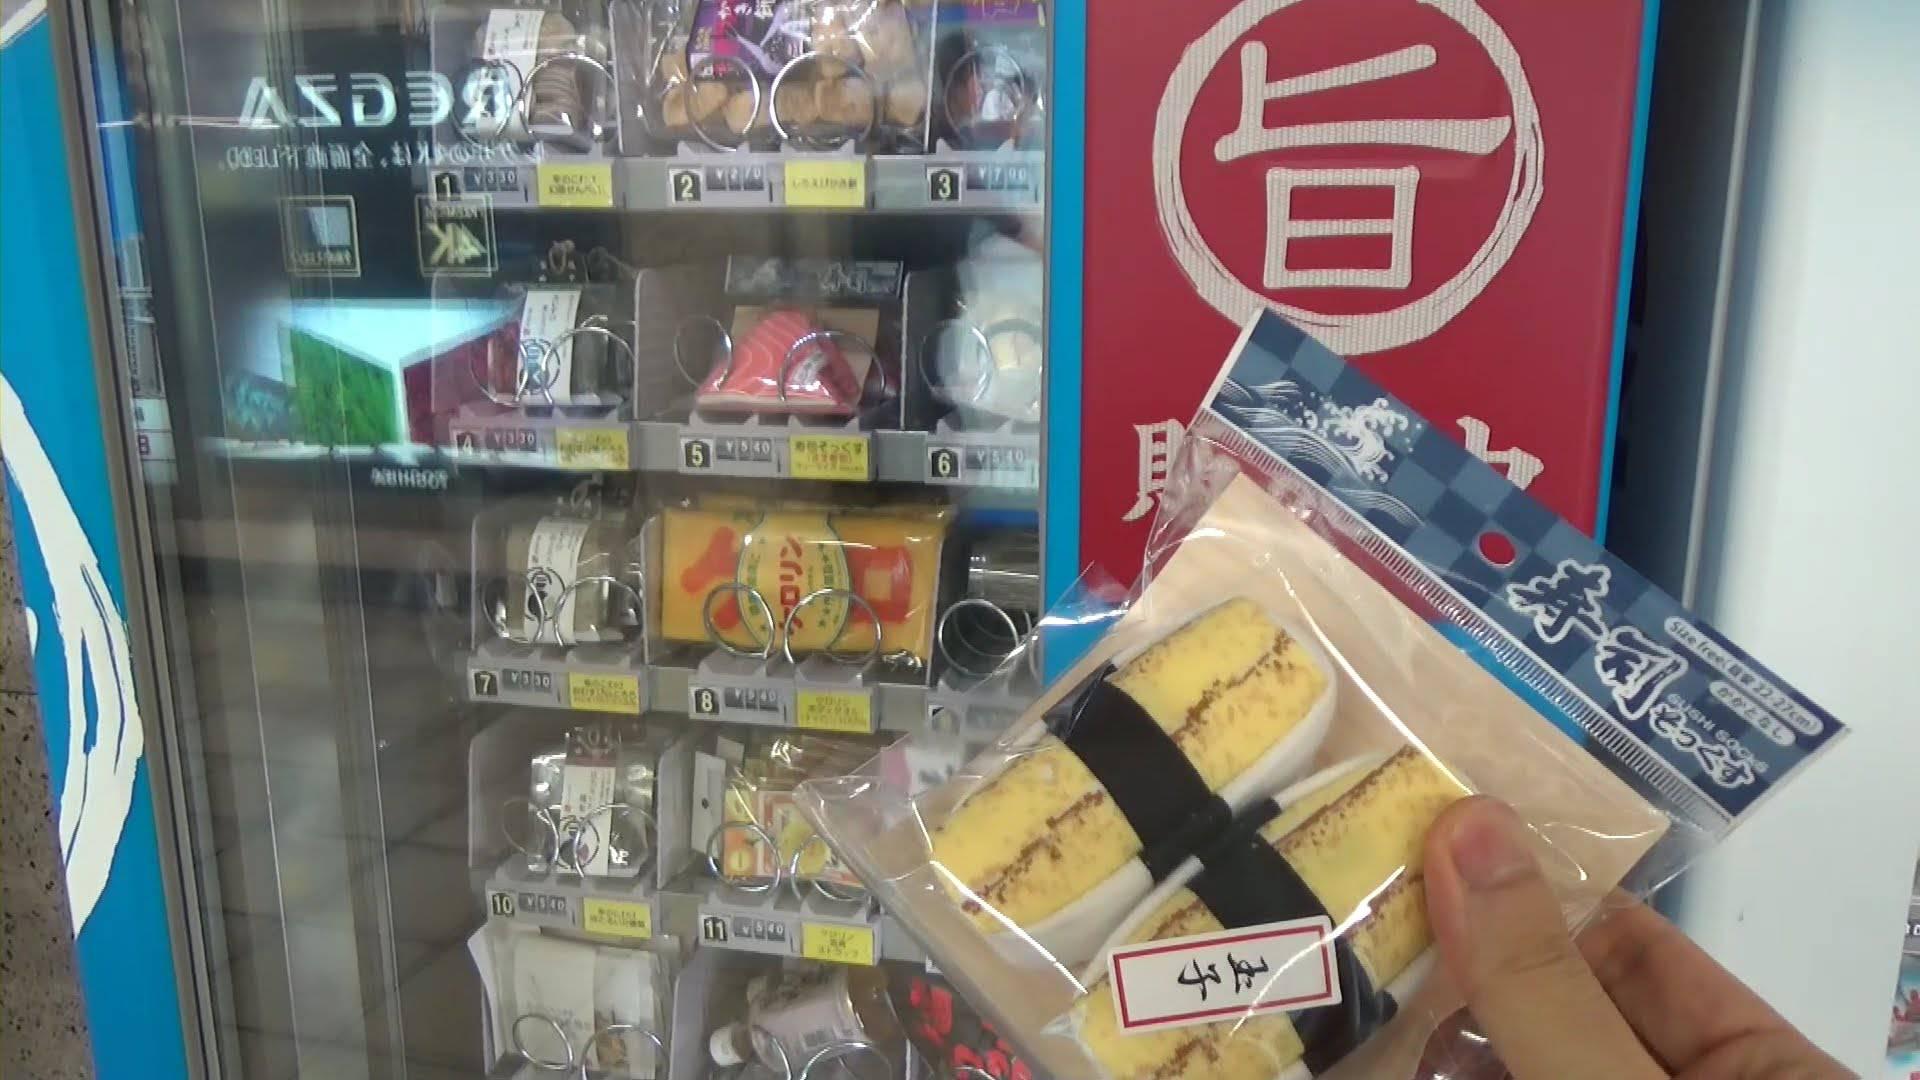 Japan's Strangest Vending Machines